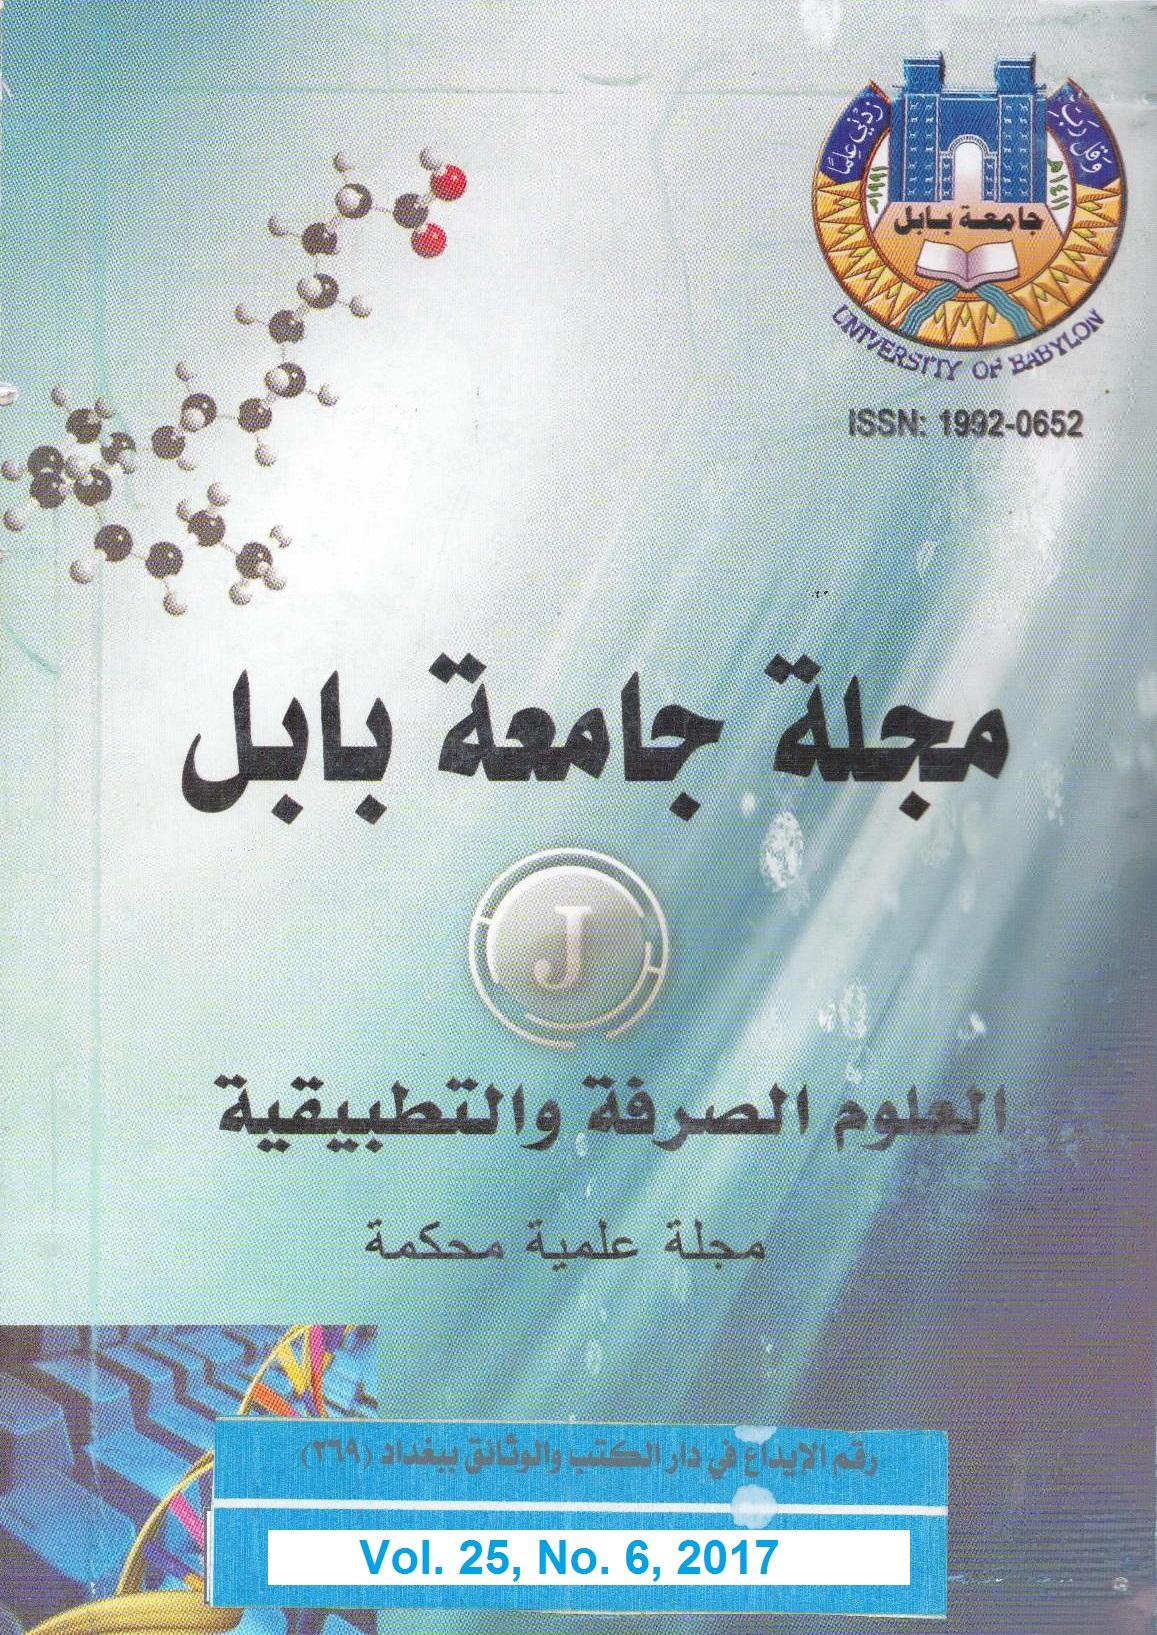 JUBPAS: 25(6) 2017 - Arabic